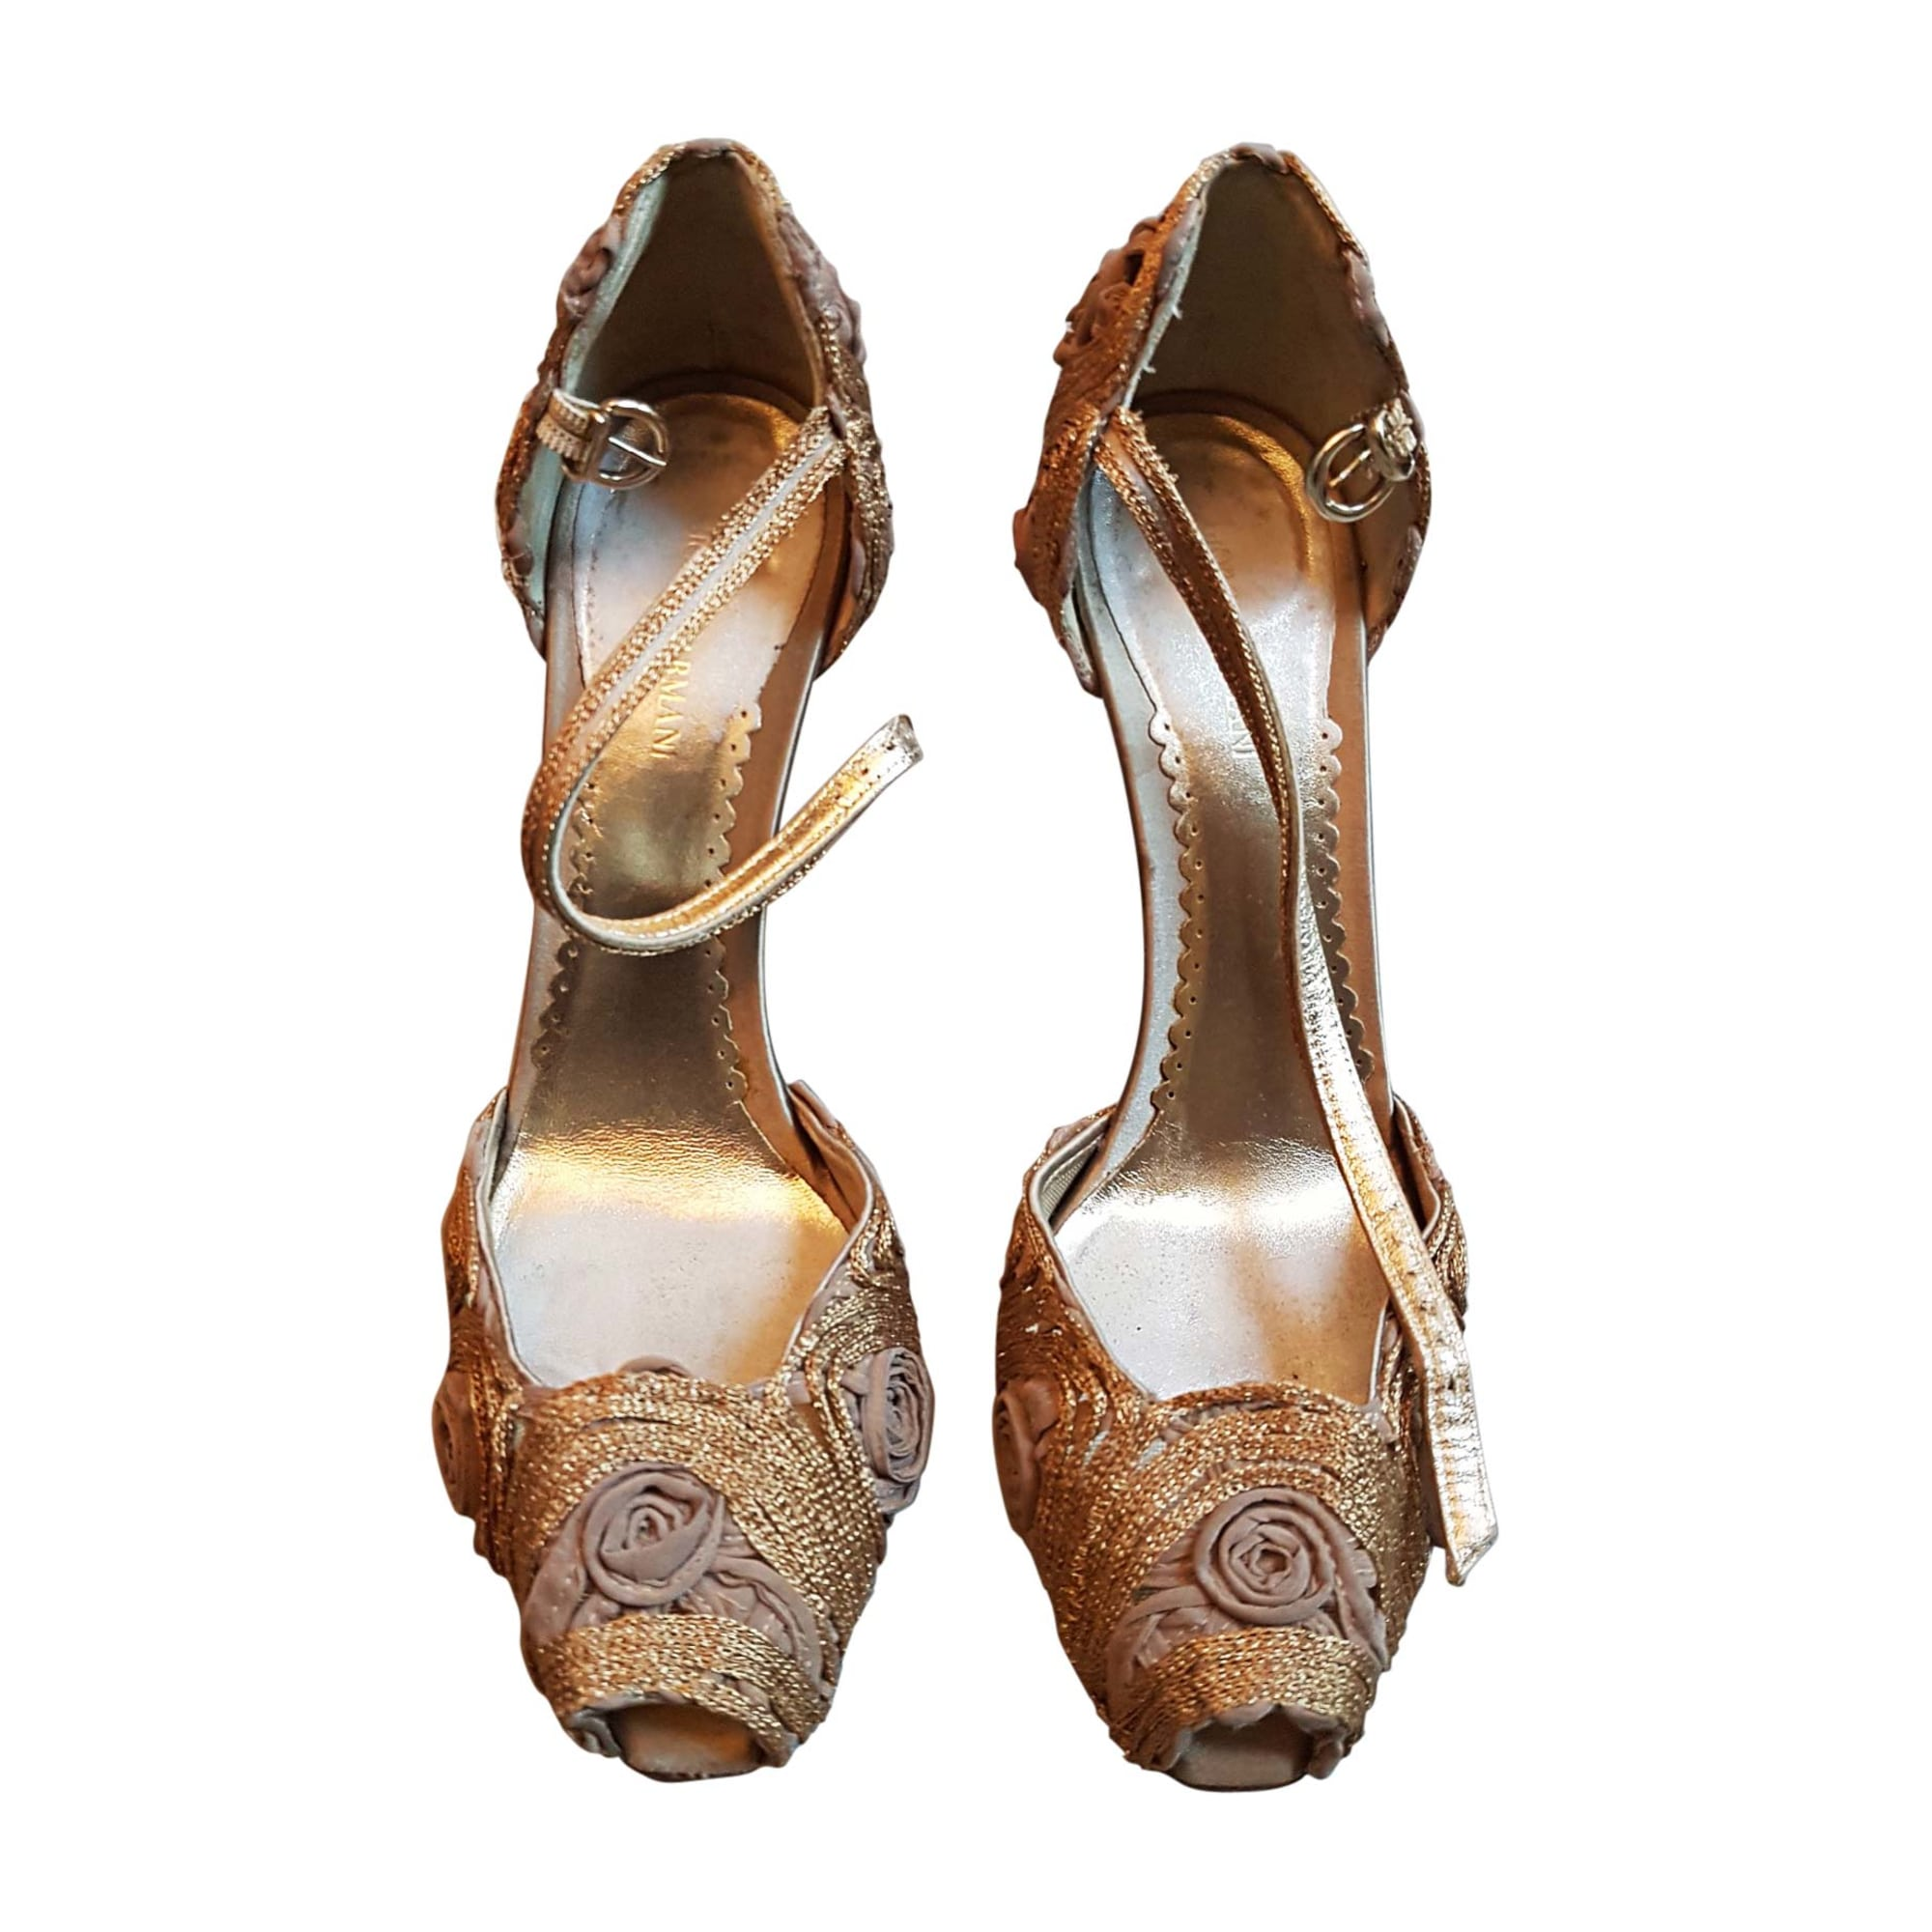 Escarpins à bouts ouverts GIORGIO ARMANI Doré, bronze, cuivre